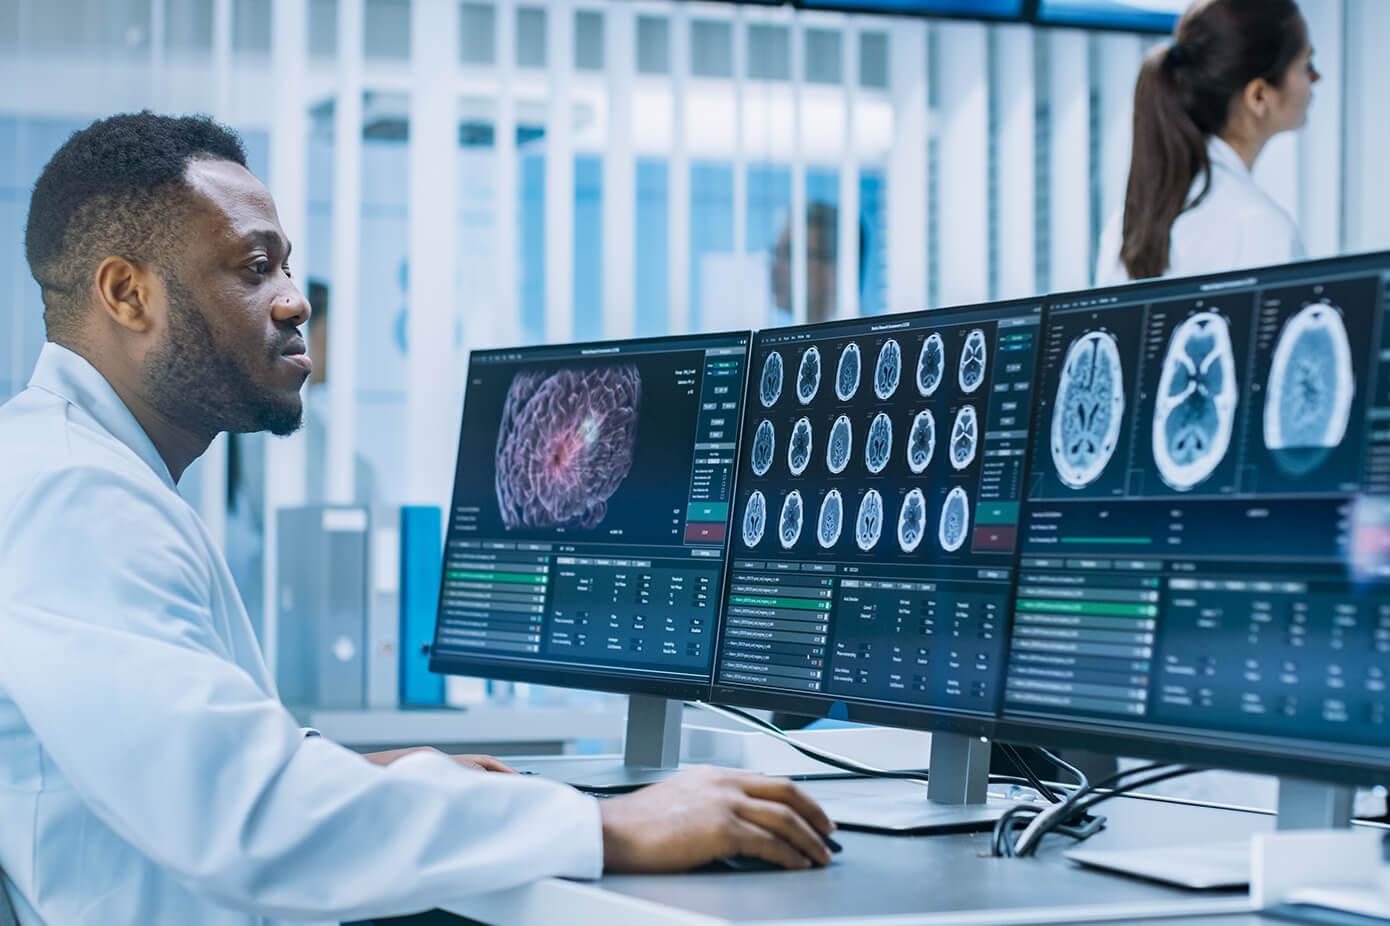 computed_tomography_CT_digital_x-ray_medical_imaging_sensor_CMOS_MRI_PET_1390x956